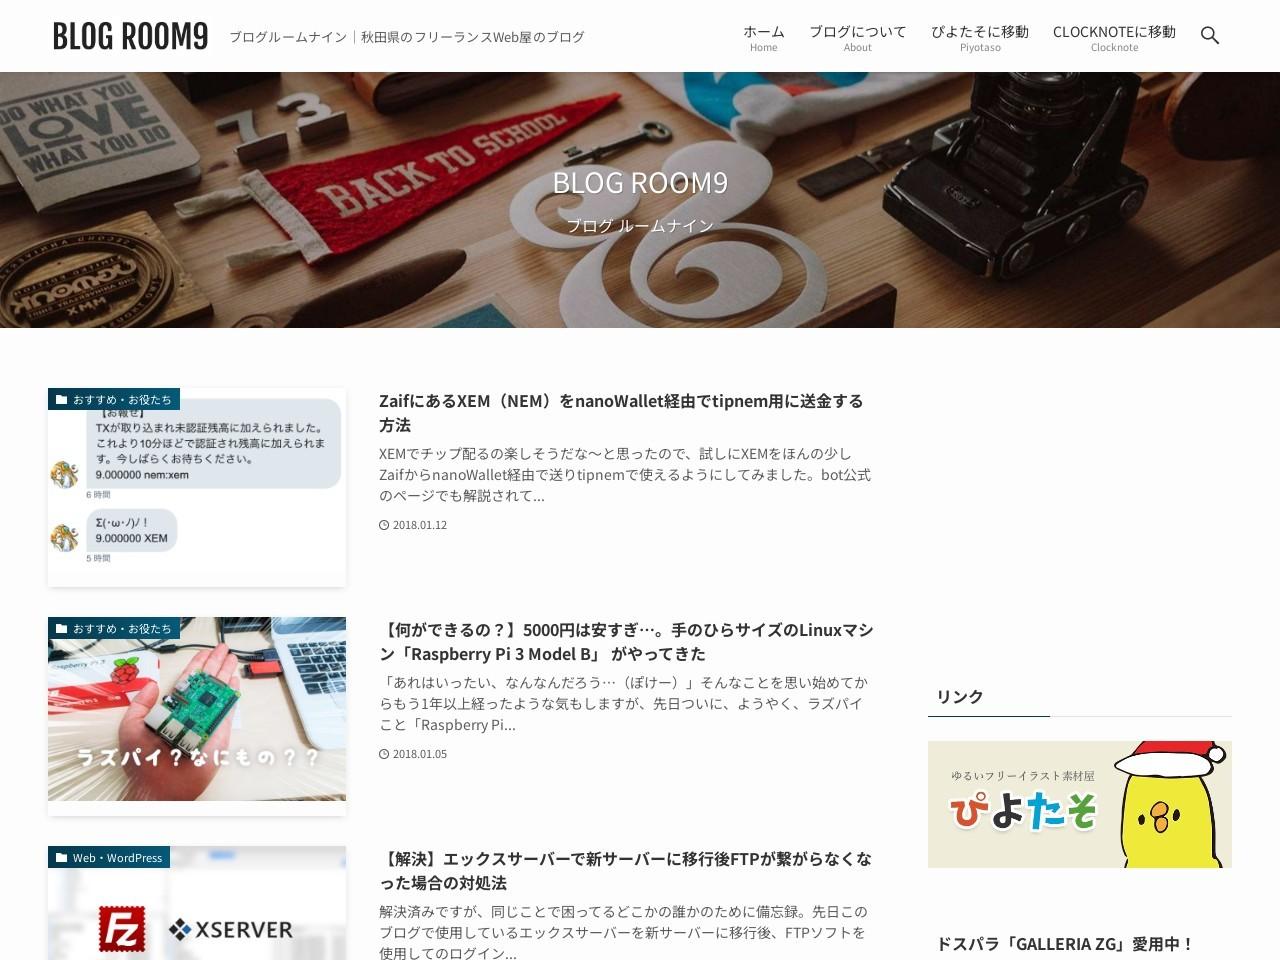 http://room9.jp/2013/12/08/173054/